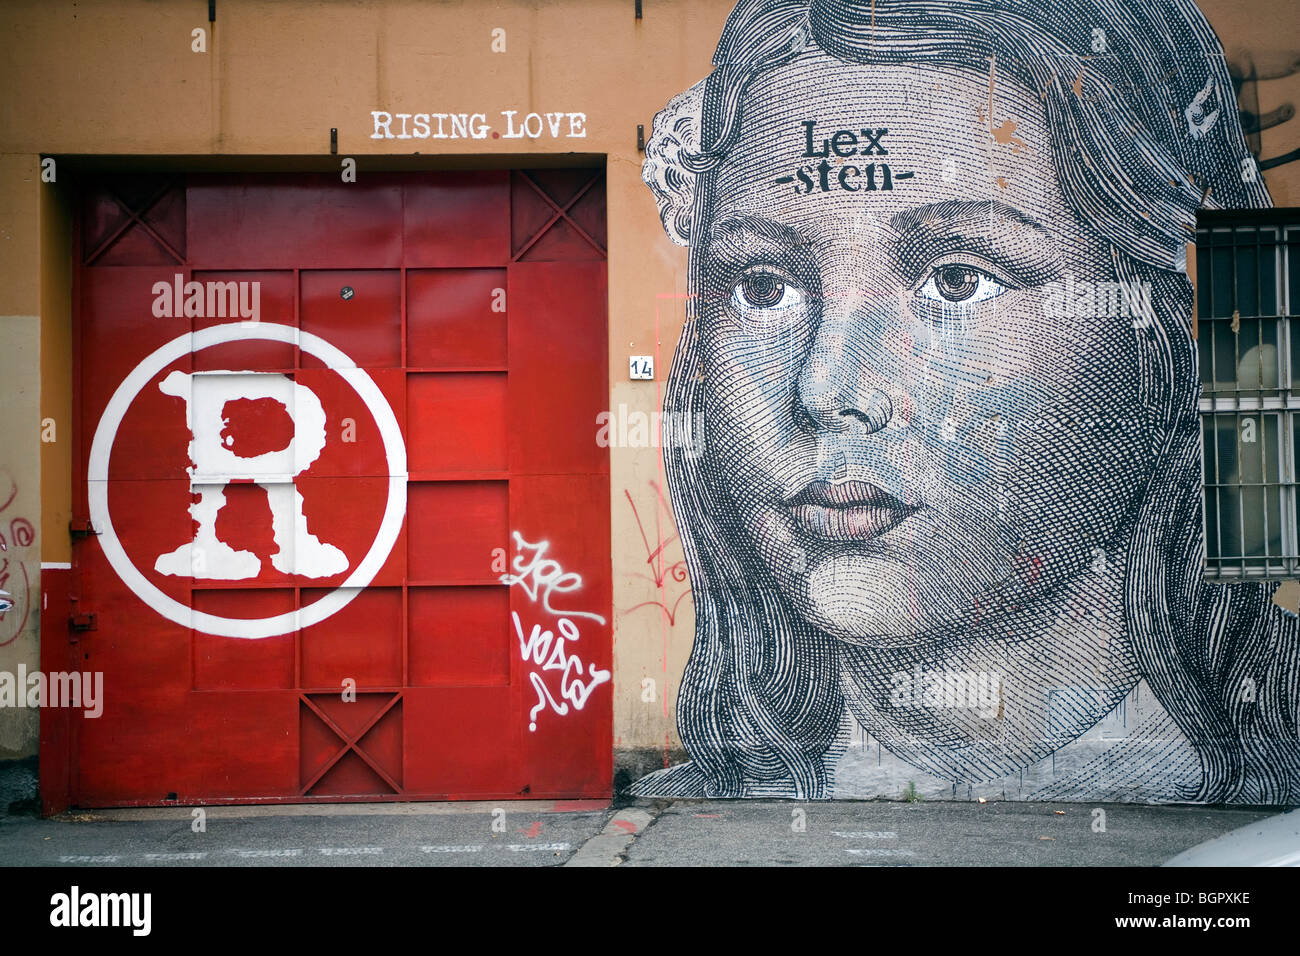 Steigende Liebe zeichnen Graffiti an der Wand Rom, Italien Stockbild